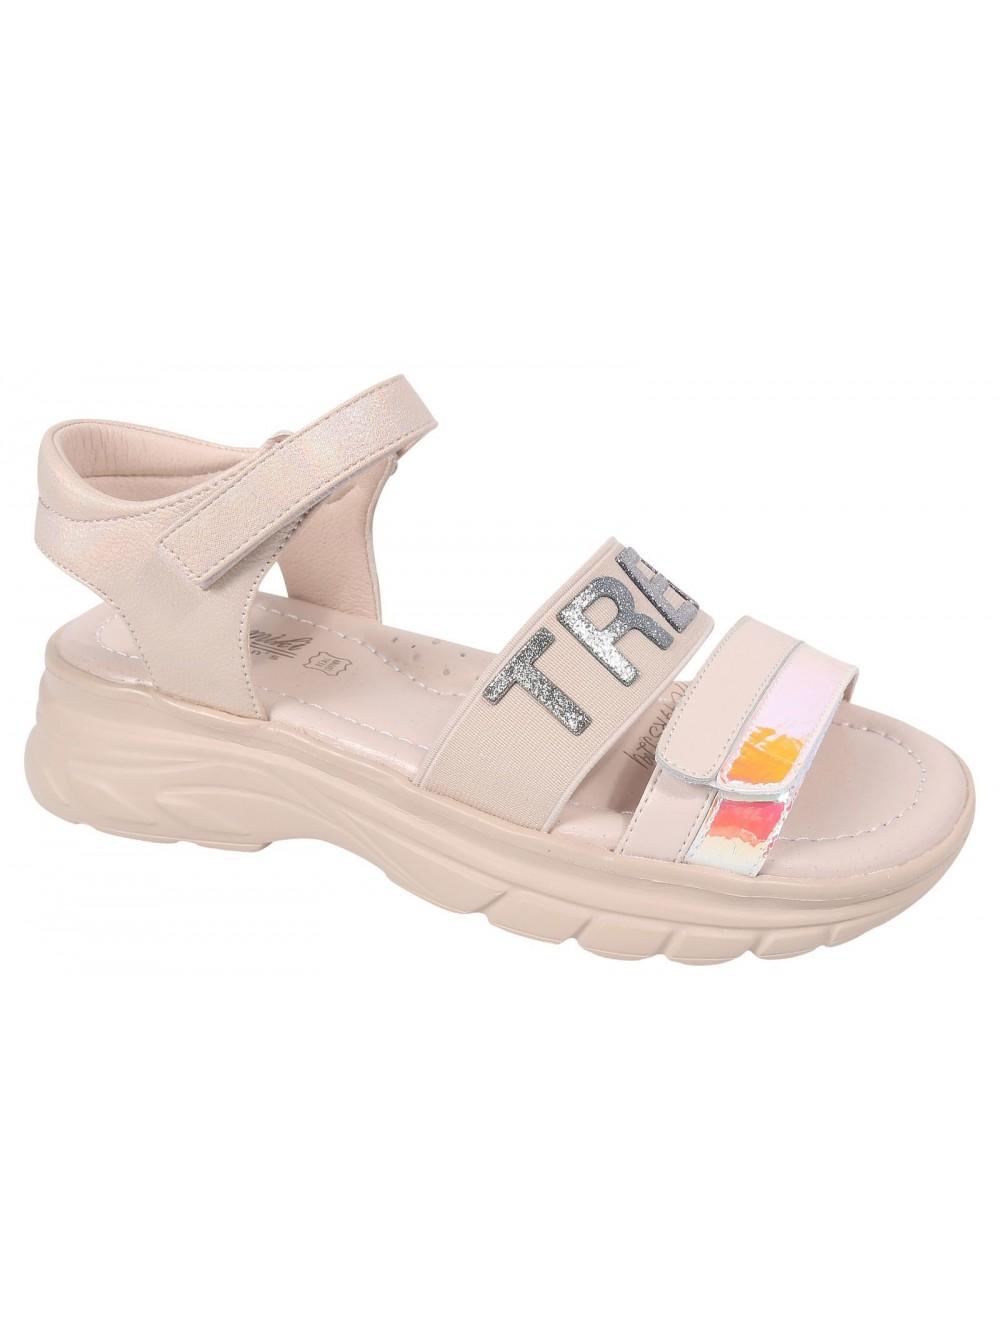 Туфли открытые Tom&Miki B-7238-E бежевый (33-37)